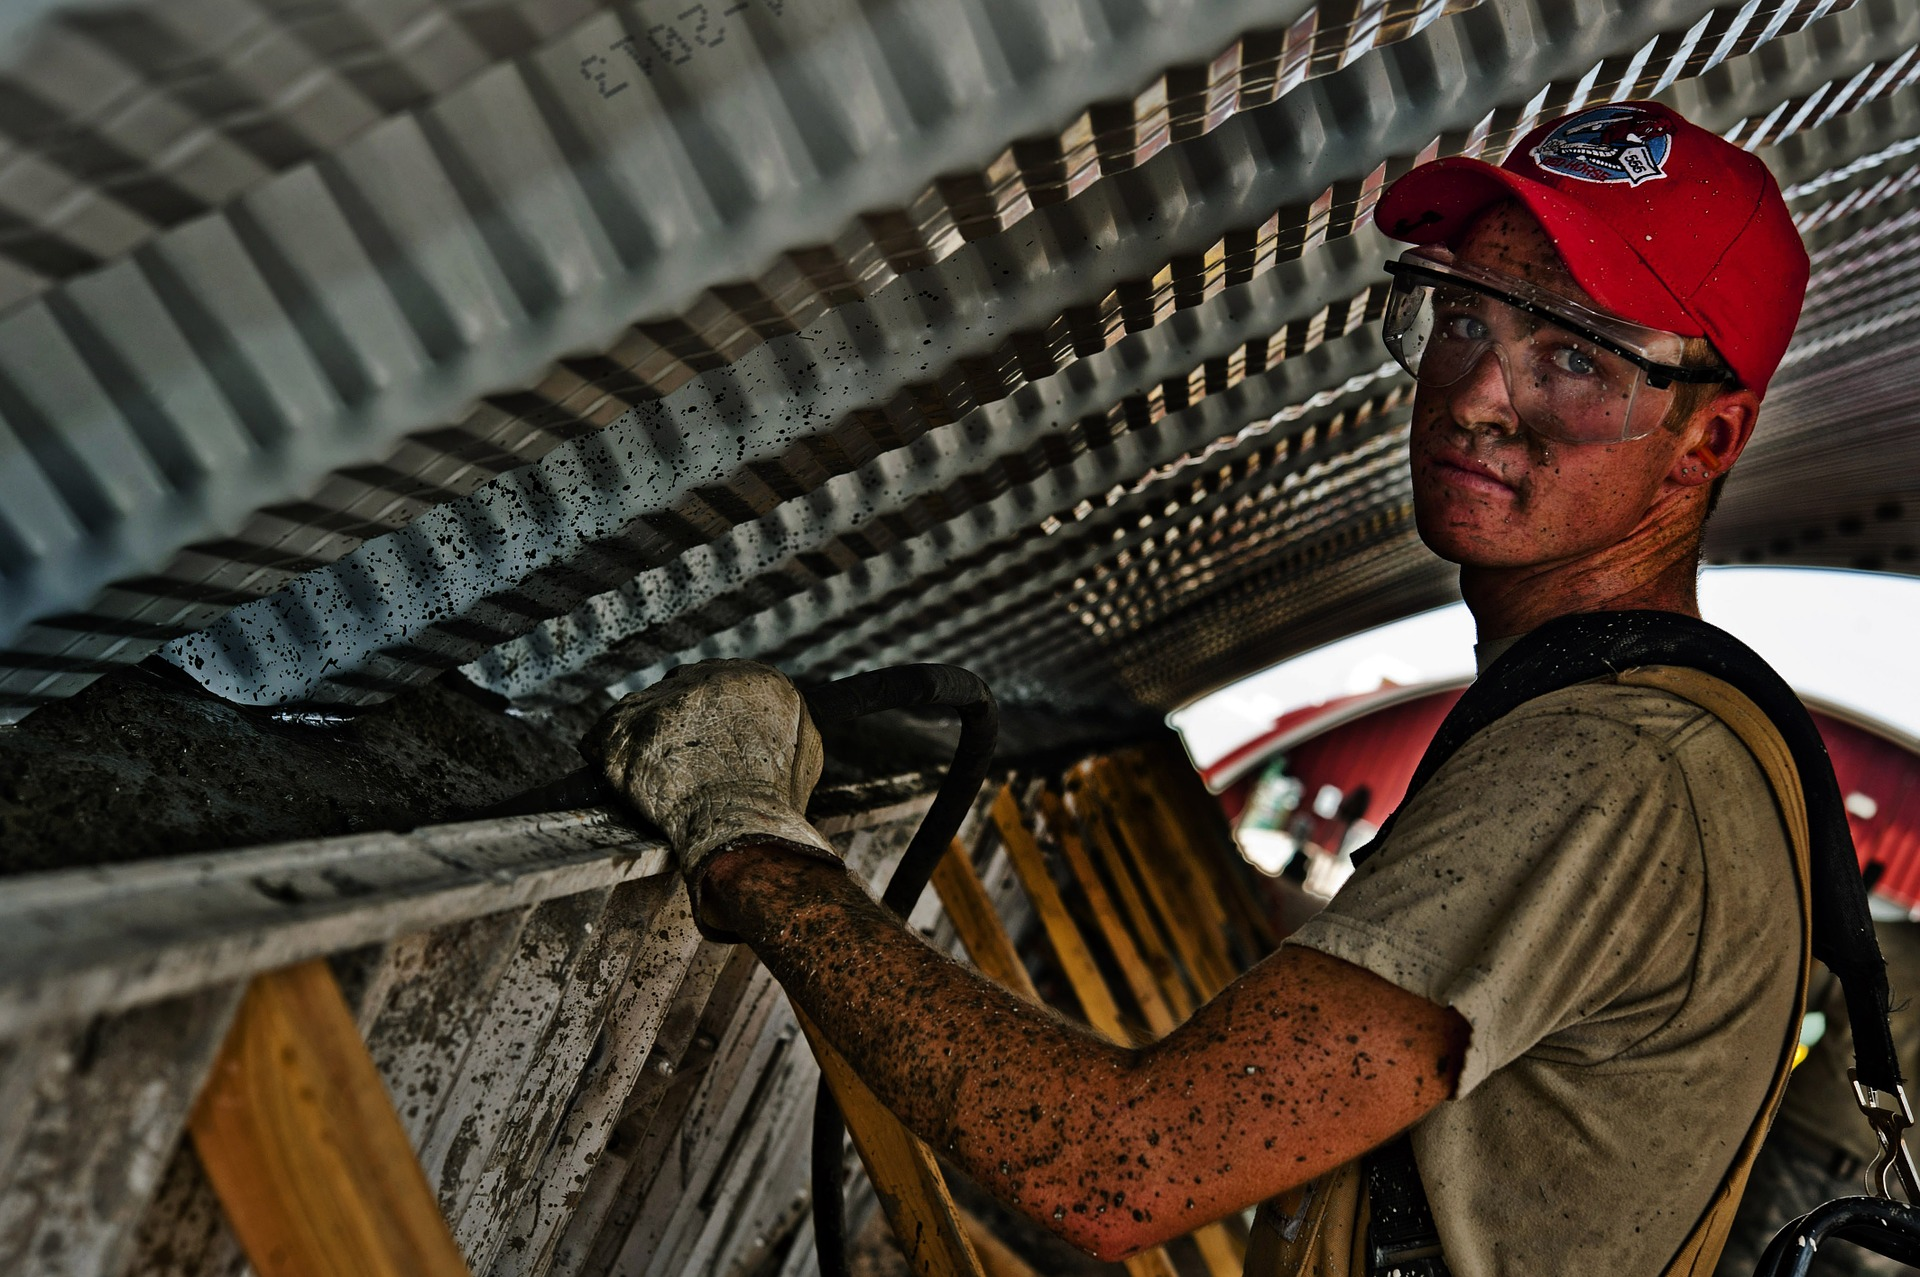 4-Nonprofits-for-Labor-Rights